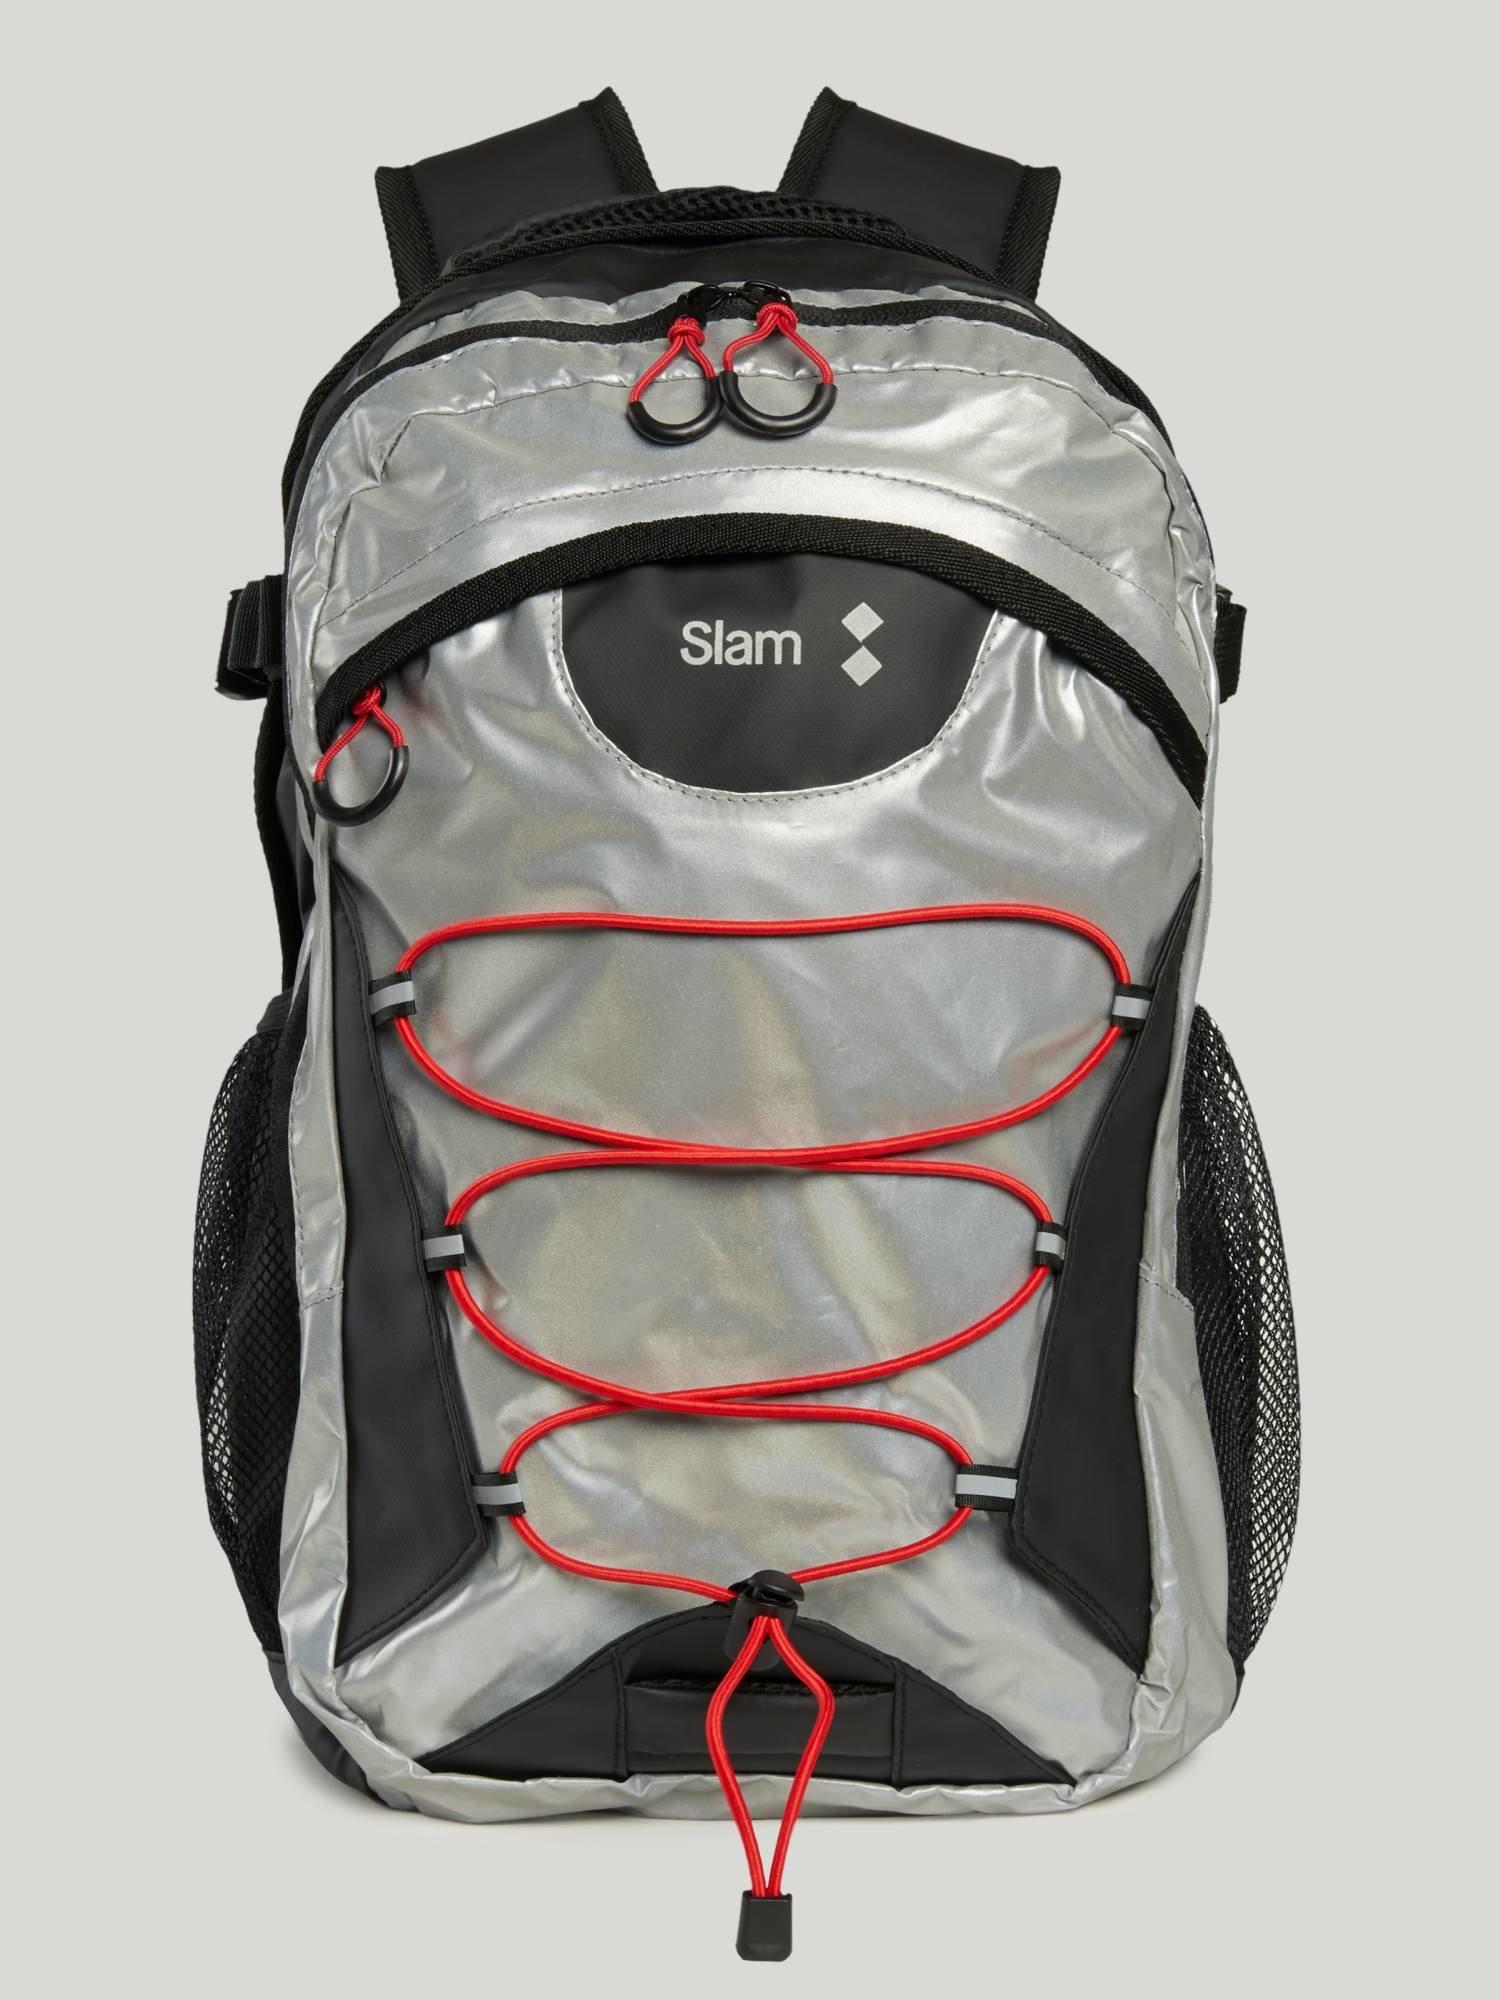 A234 backpack - Silver Reflex